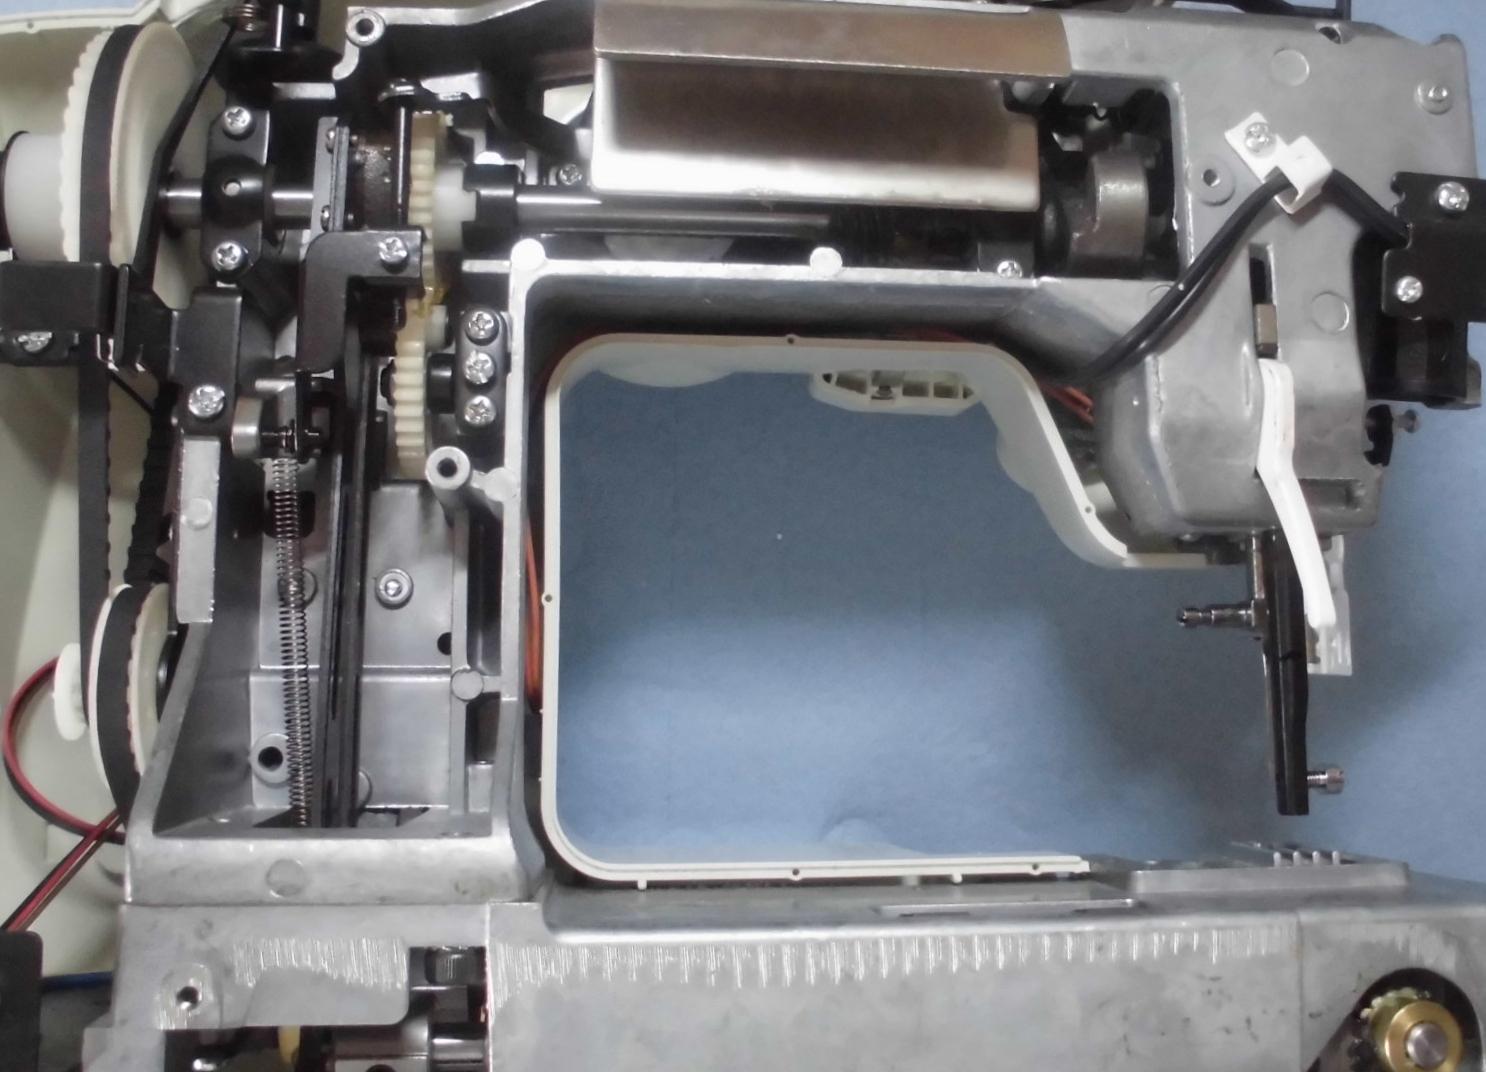 AG-002NHC|分解オーバーホールメンテナンス修理|アックスヤマザキミシン